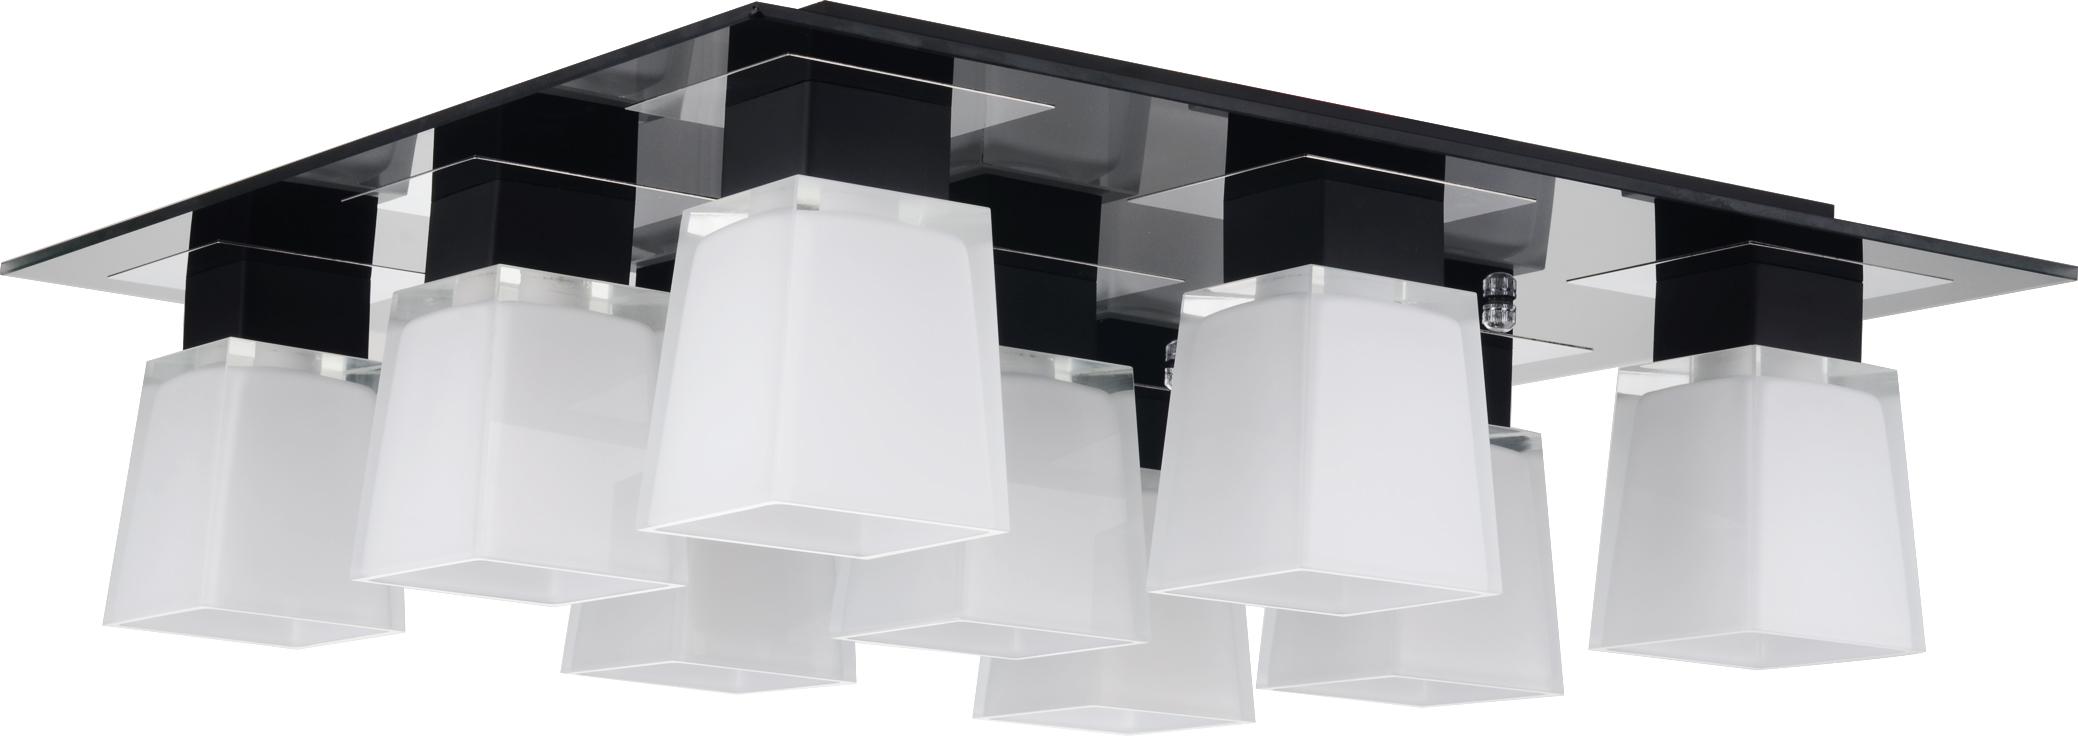 Люстра LussoleЛюстры<br>Назначение светильника: для гостиной,<br>Стиль светильника: модерн,<br>Тип: потолочная,<br>Материал светильника: металл, стекло,<br>Материал плафона: стекло,<br>Материал арматуры: металл,<br>Длина (мм): 190,<br>Ширина: 630,<br>Количество ламп: 9,<br>Тип лампы: накаливания,<br>Мощность: 40,<br>Патрон: Е14,<br>Цвет арматуры: хром<br>